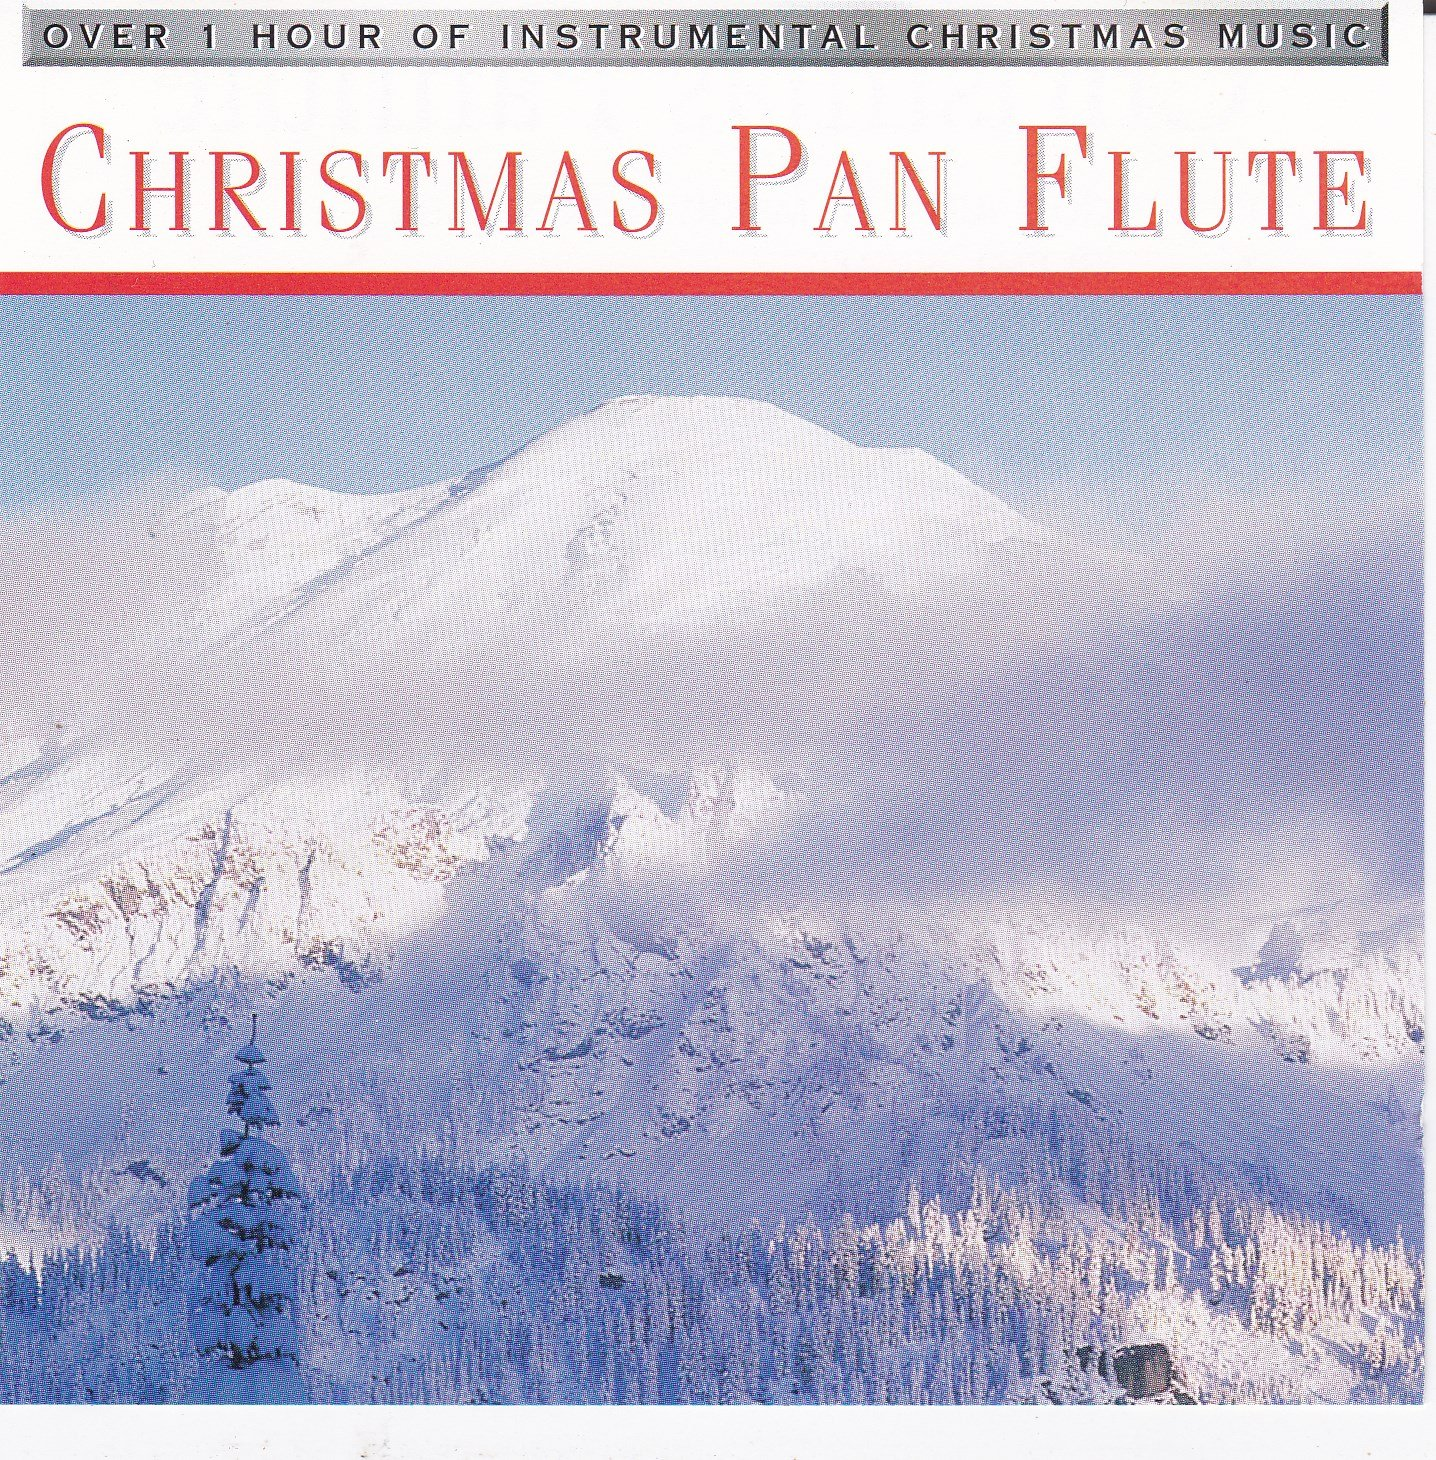 Various - Christmas Pan Flute - Amazon.com Music